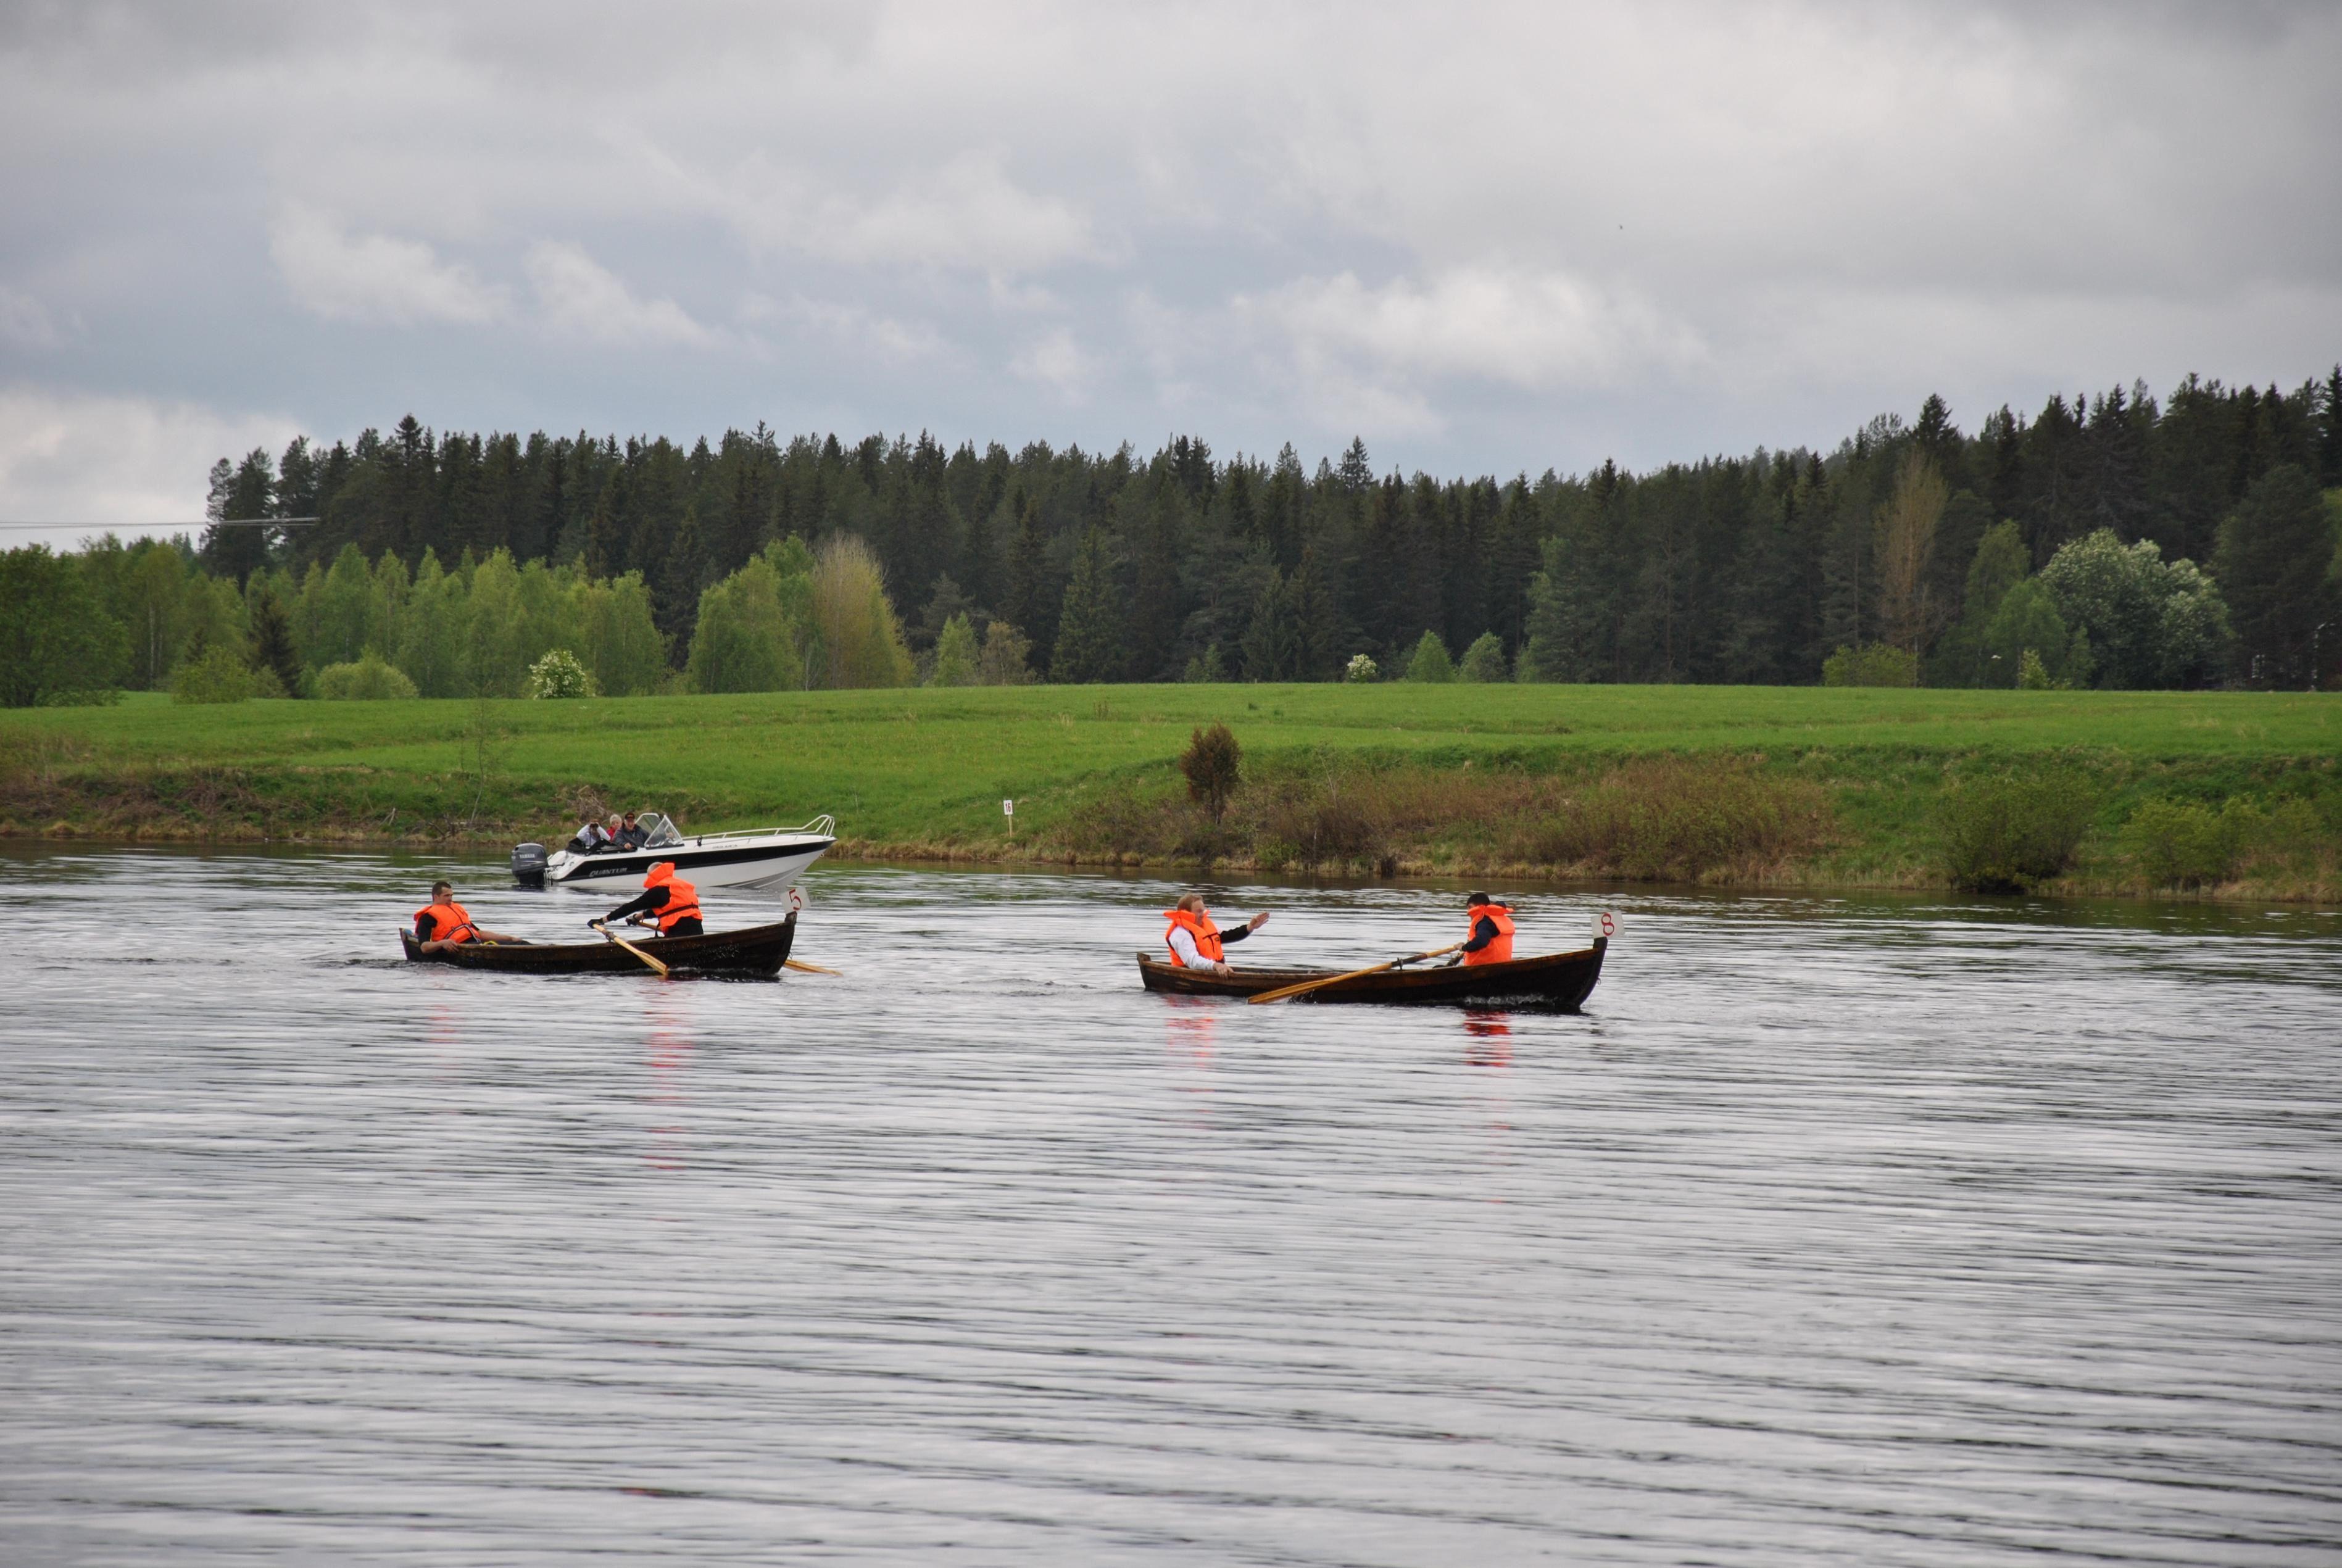 Agnetha Perman, Flottarrännet i Långsele